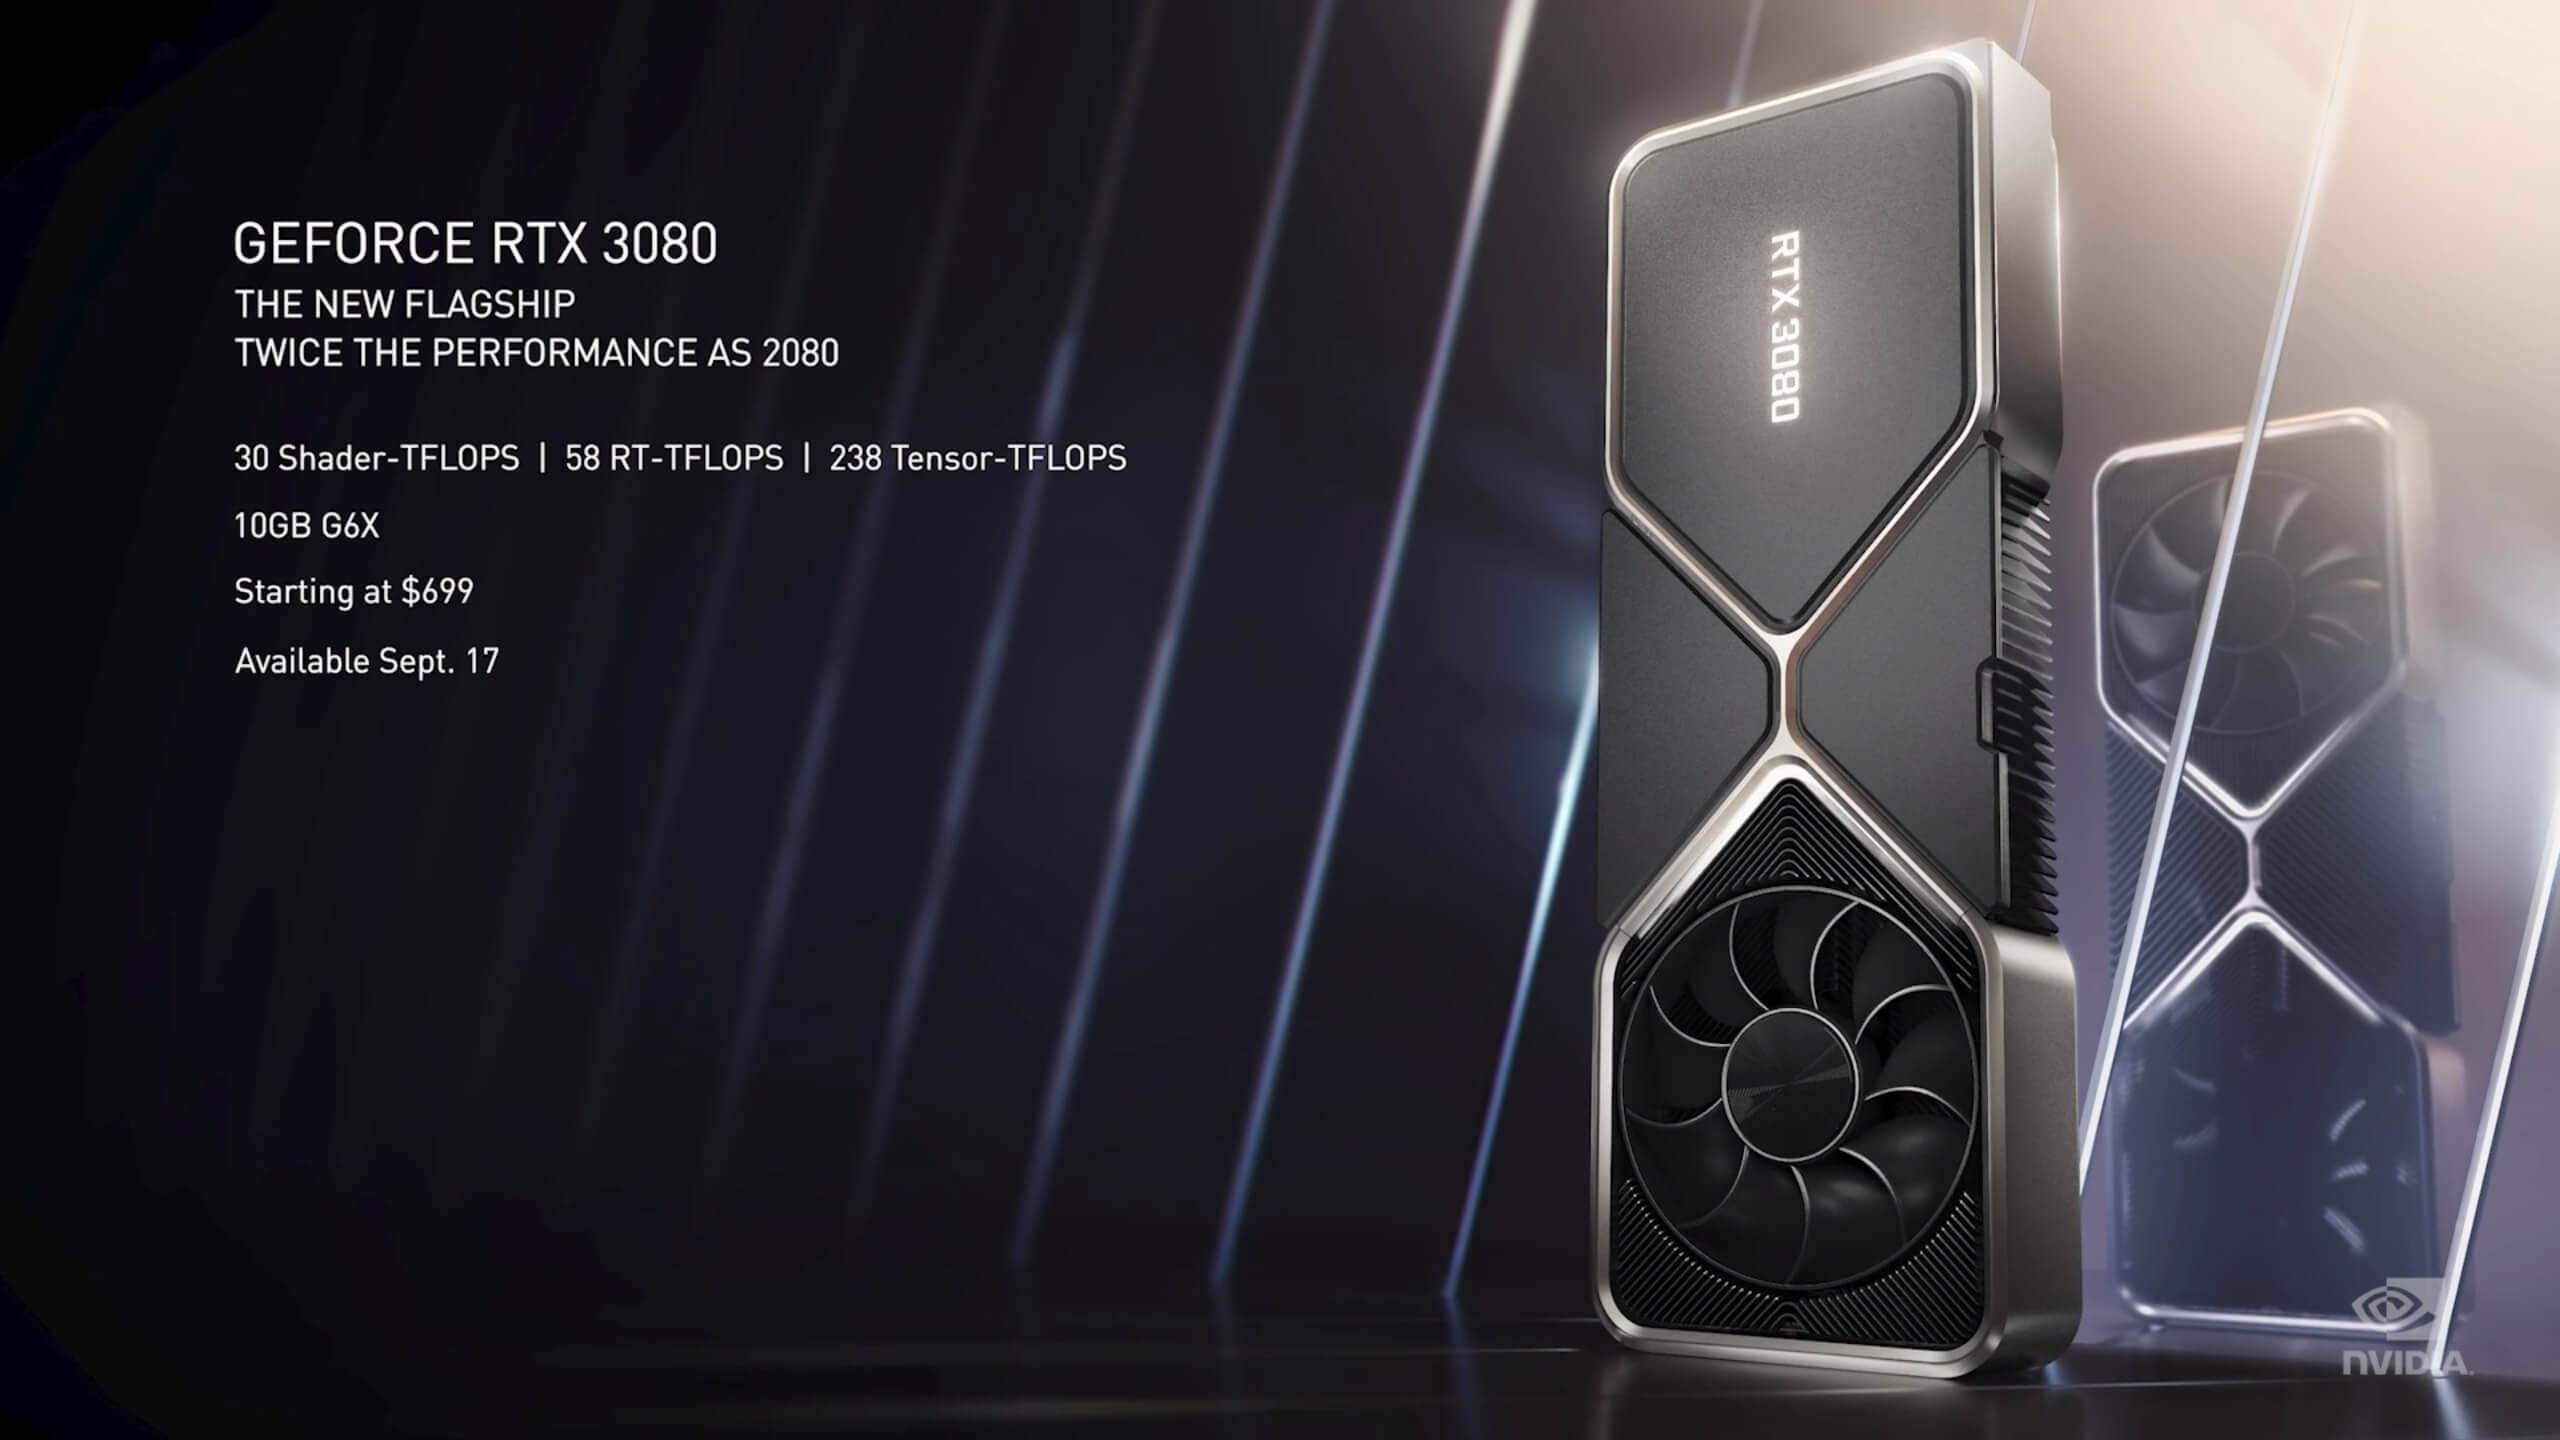 NVIDIA RTX3080